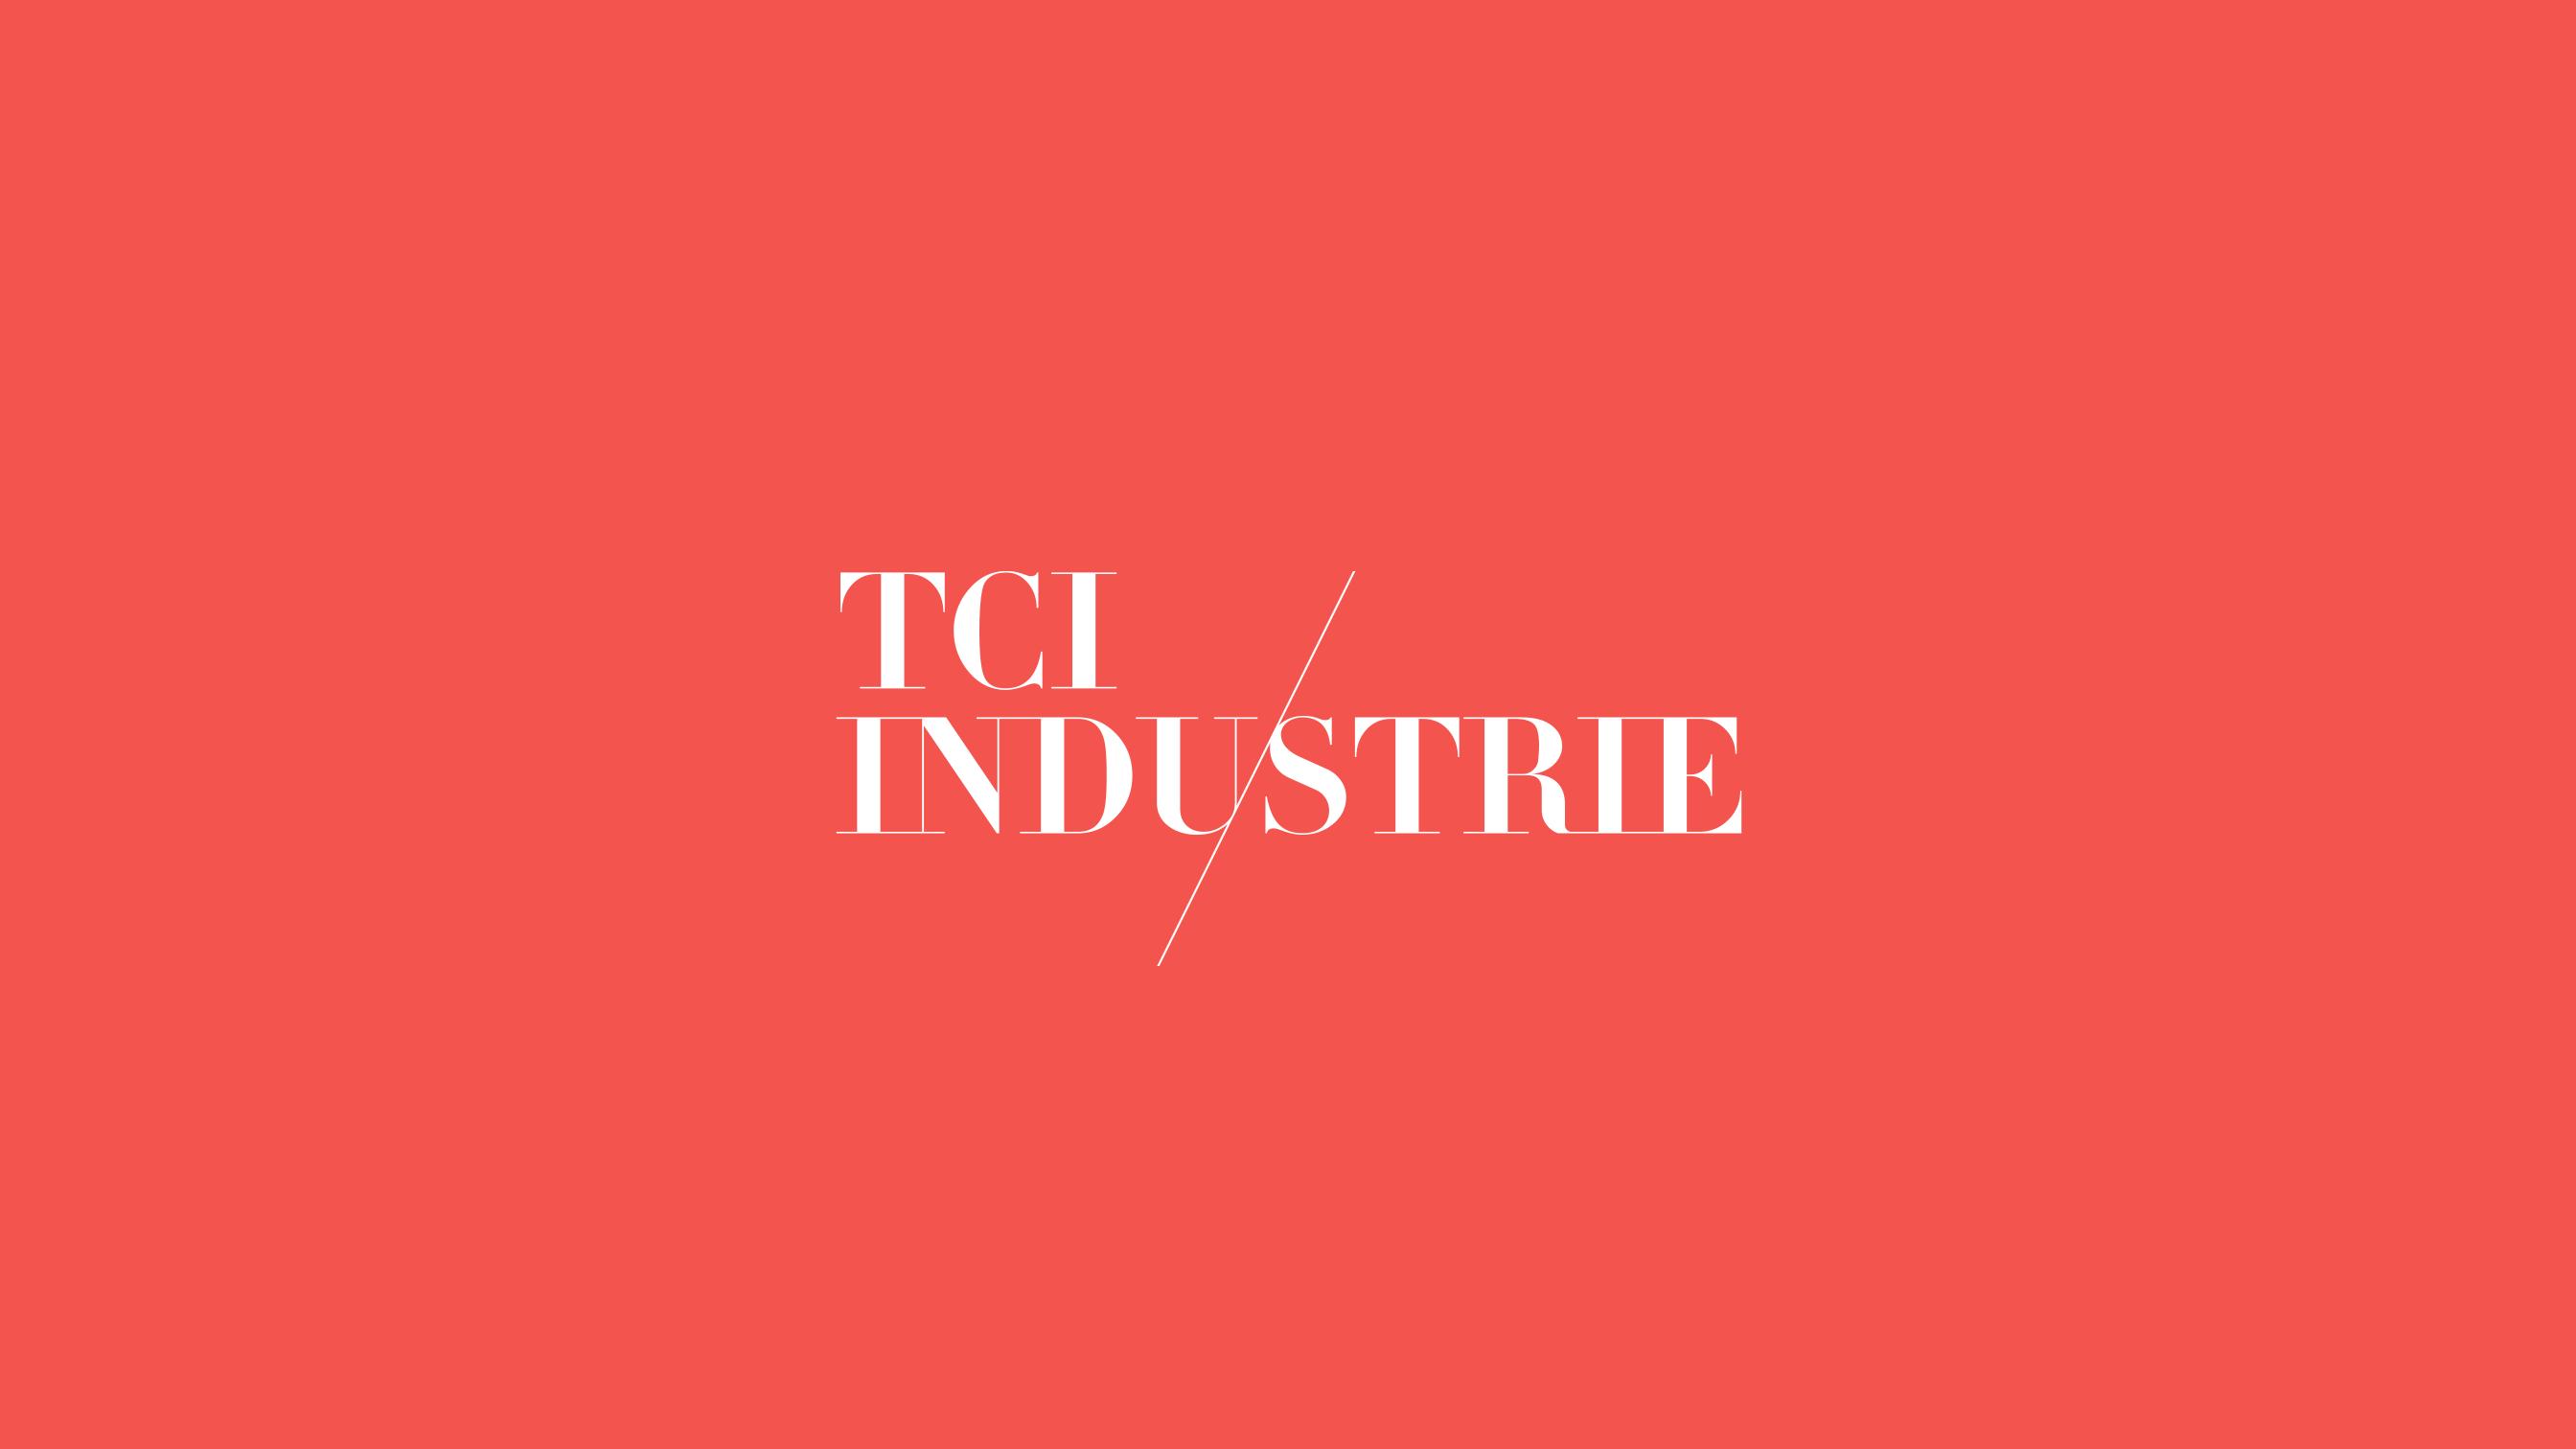 tciindustrie-logotype-pikteo